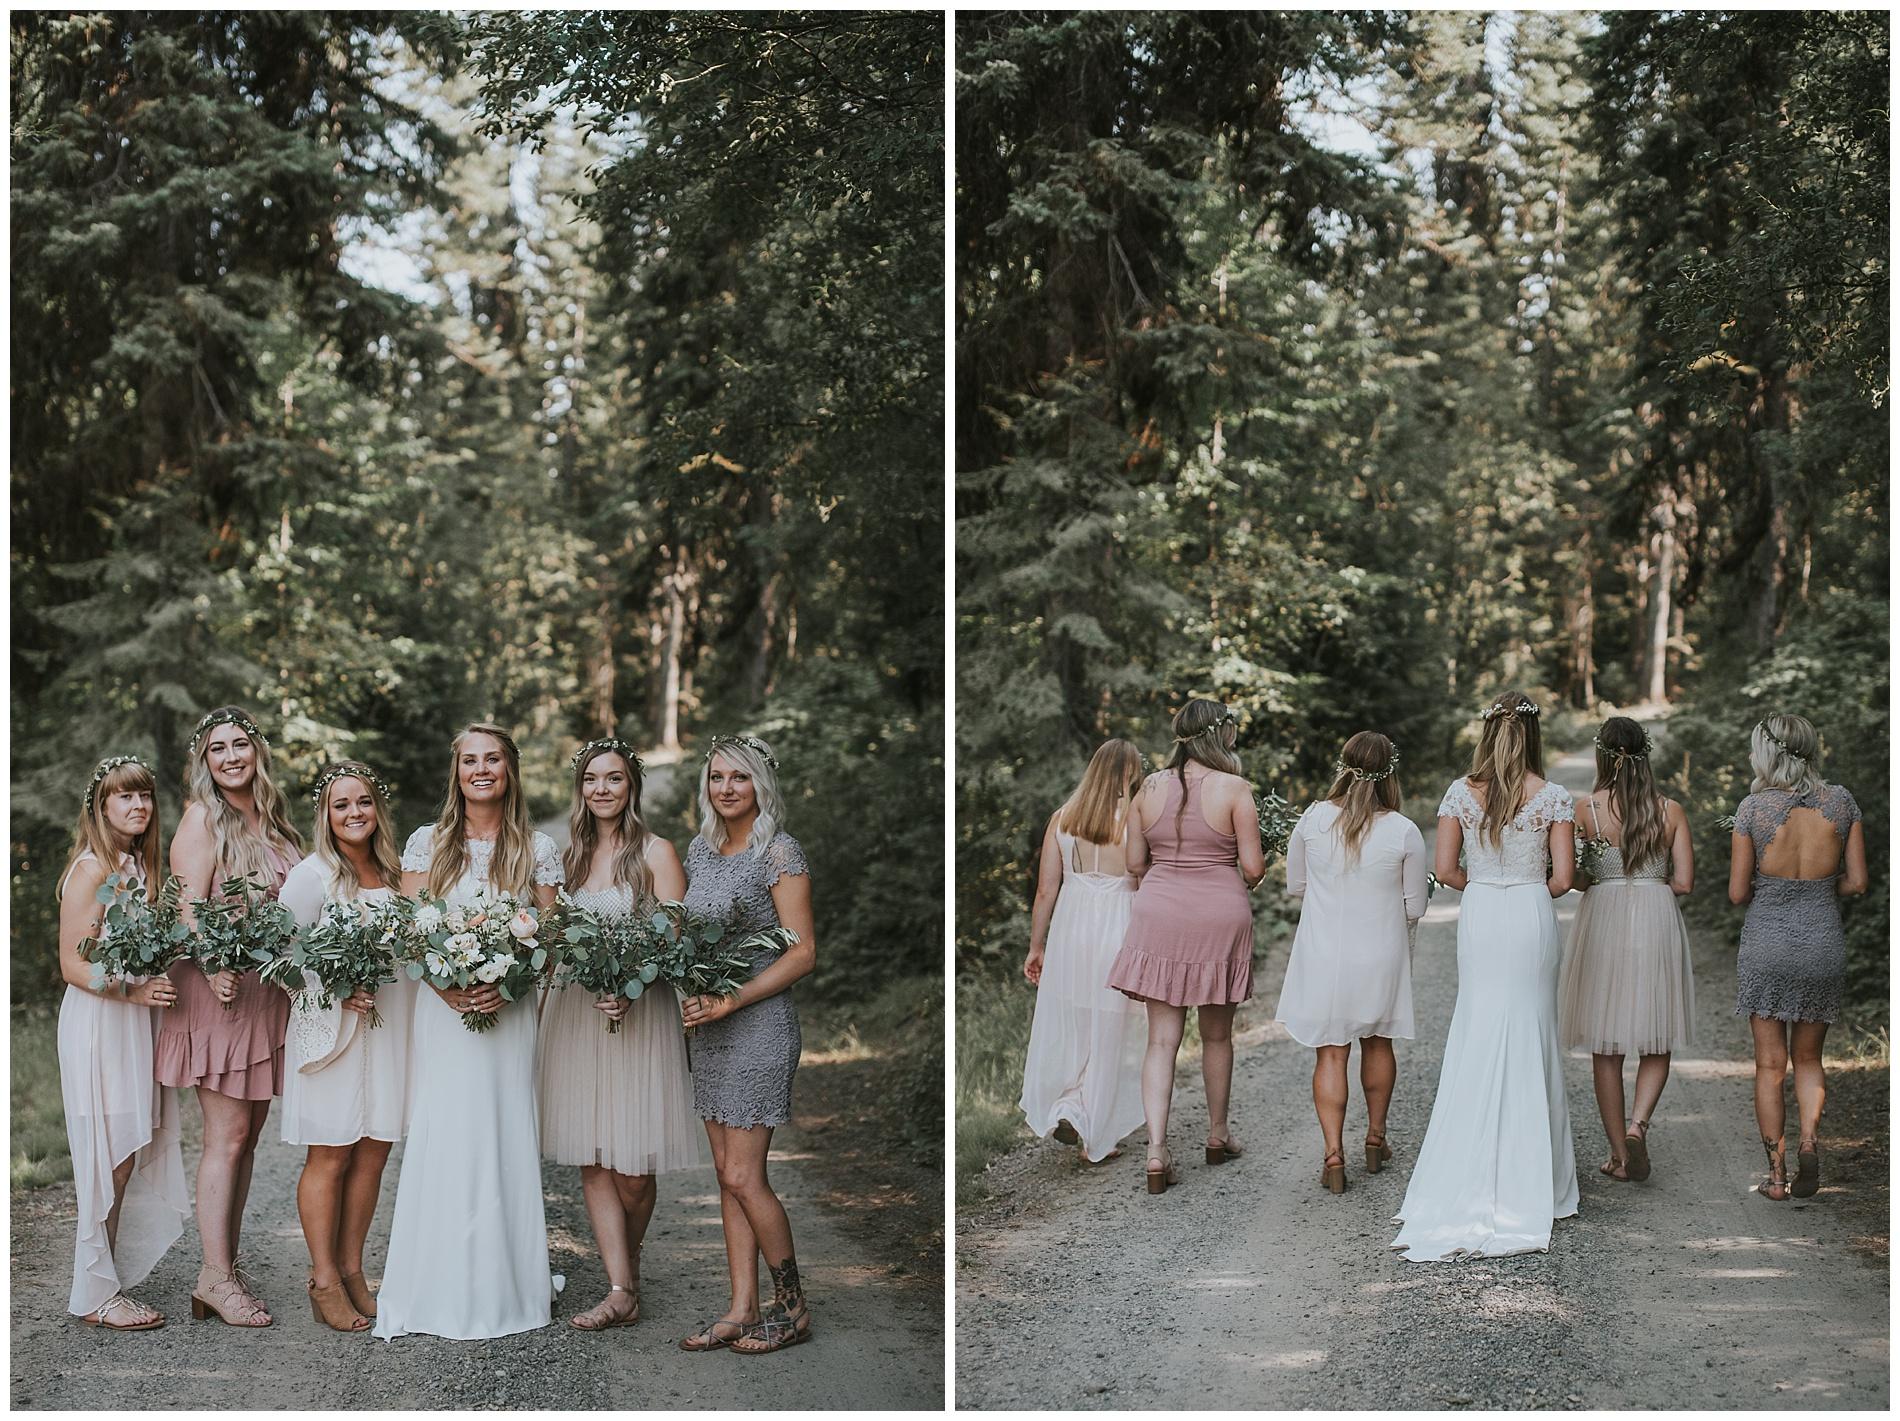 Boho Bridesmaids in McCall idaho